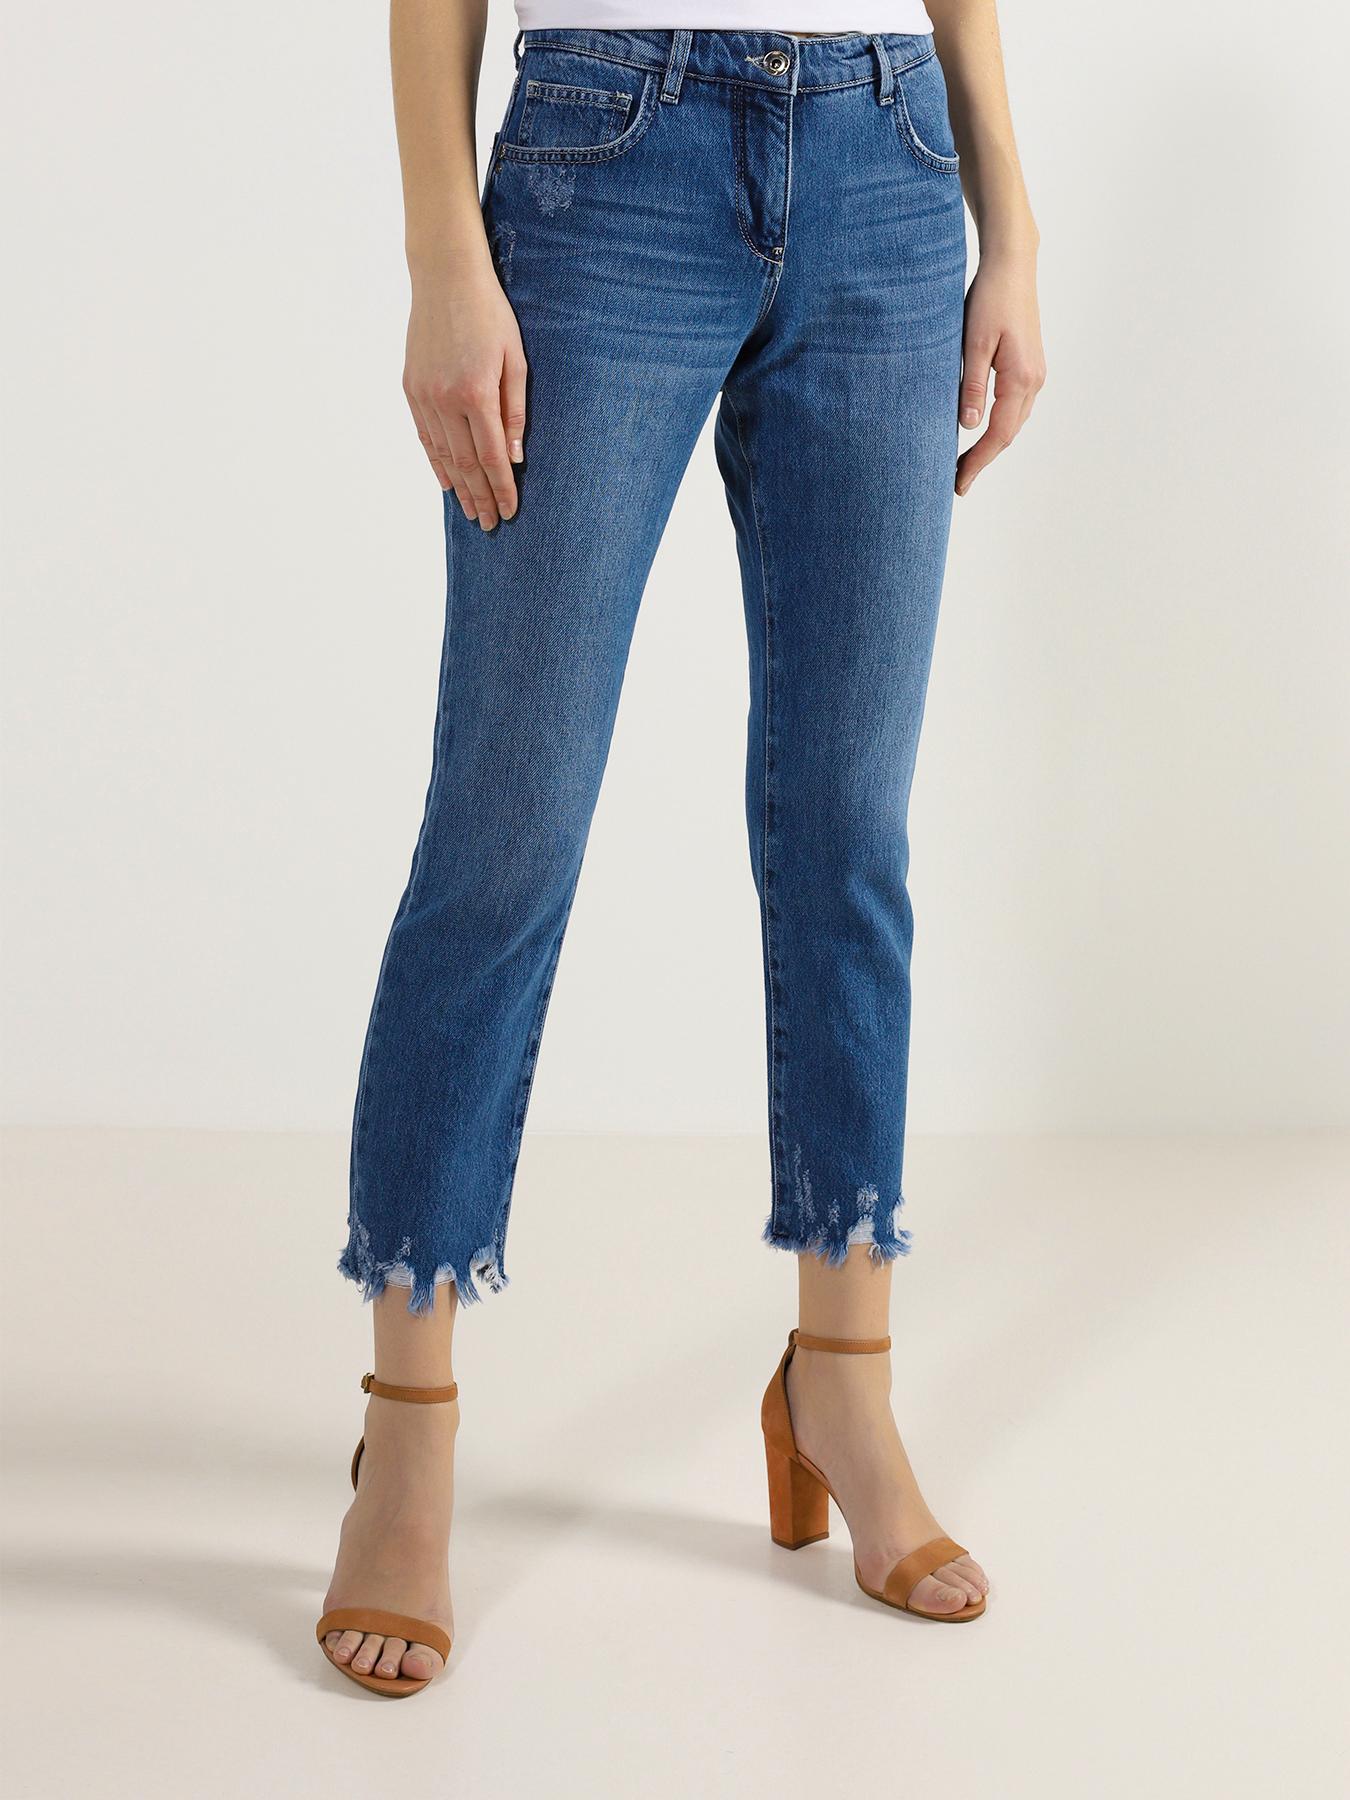 Джинсы Patrizia Pepe Джинсы джинсы pepe jeans джинсы